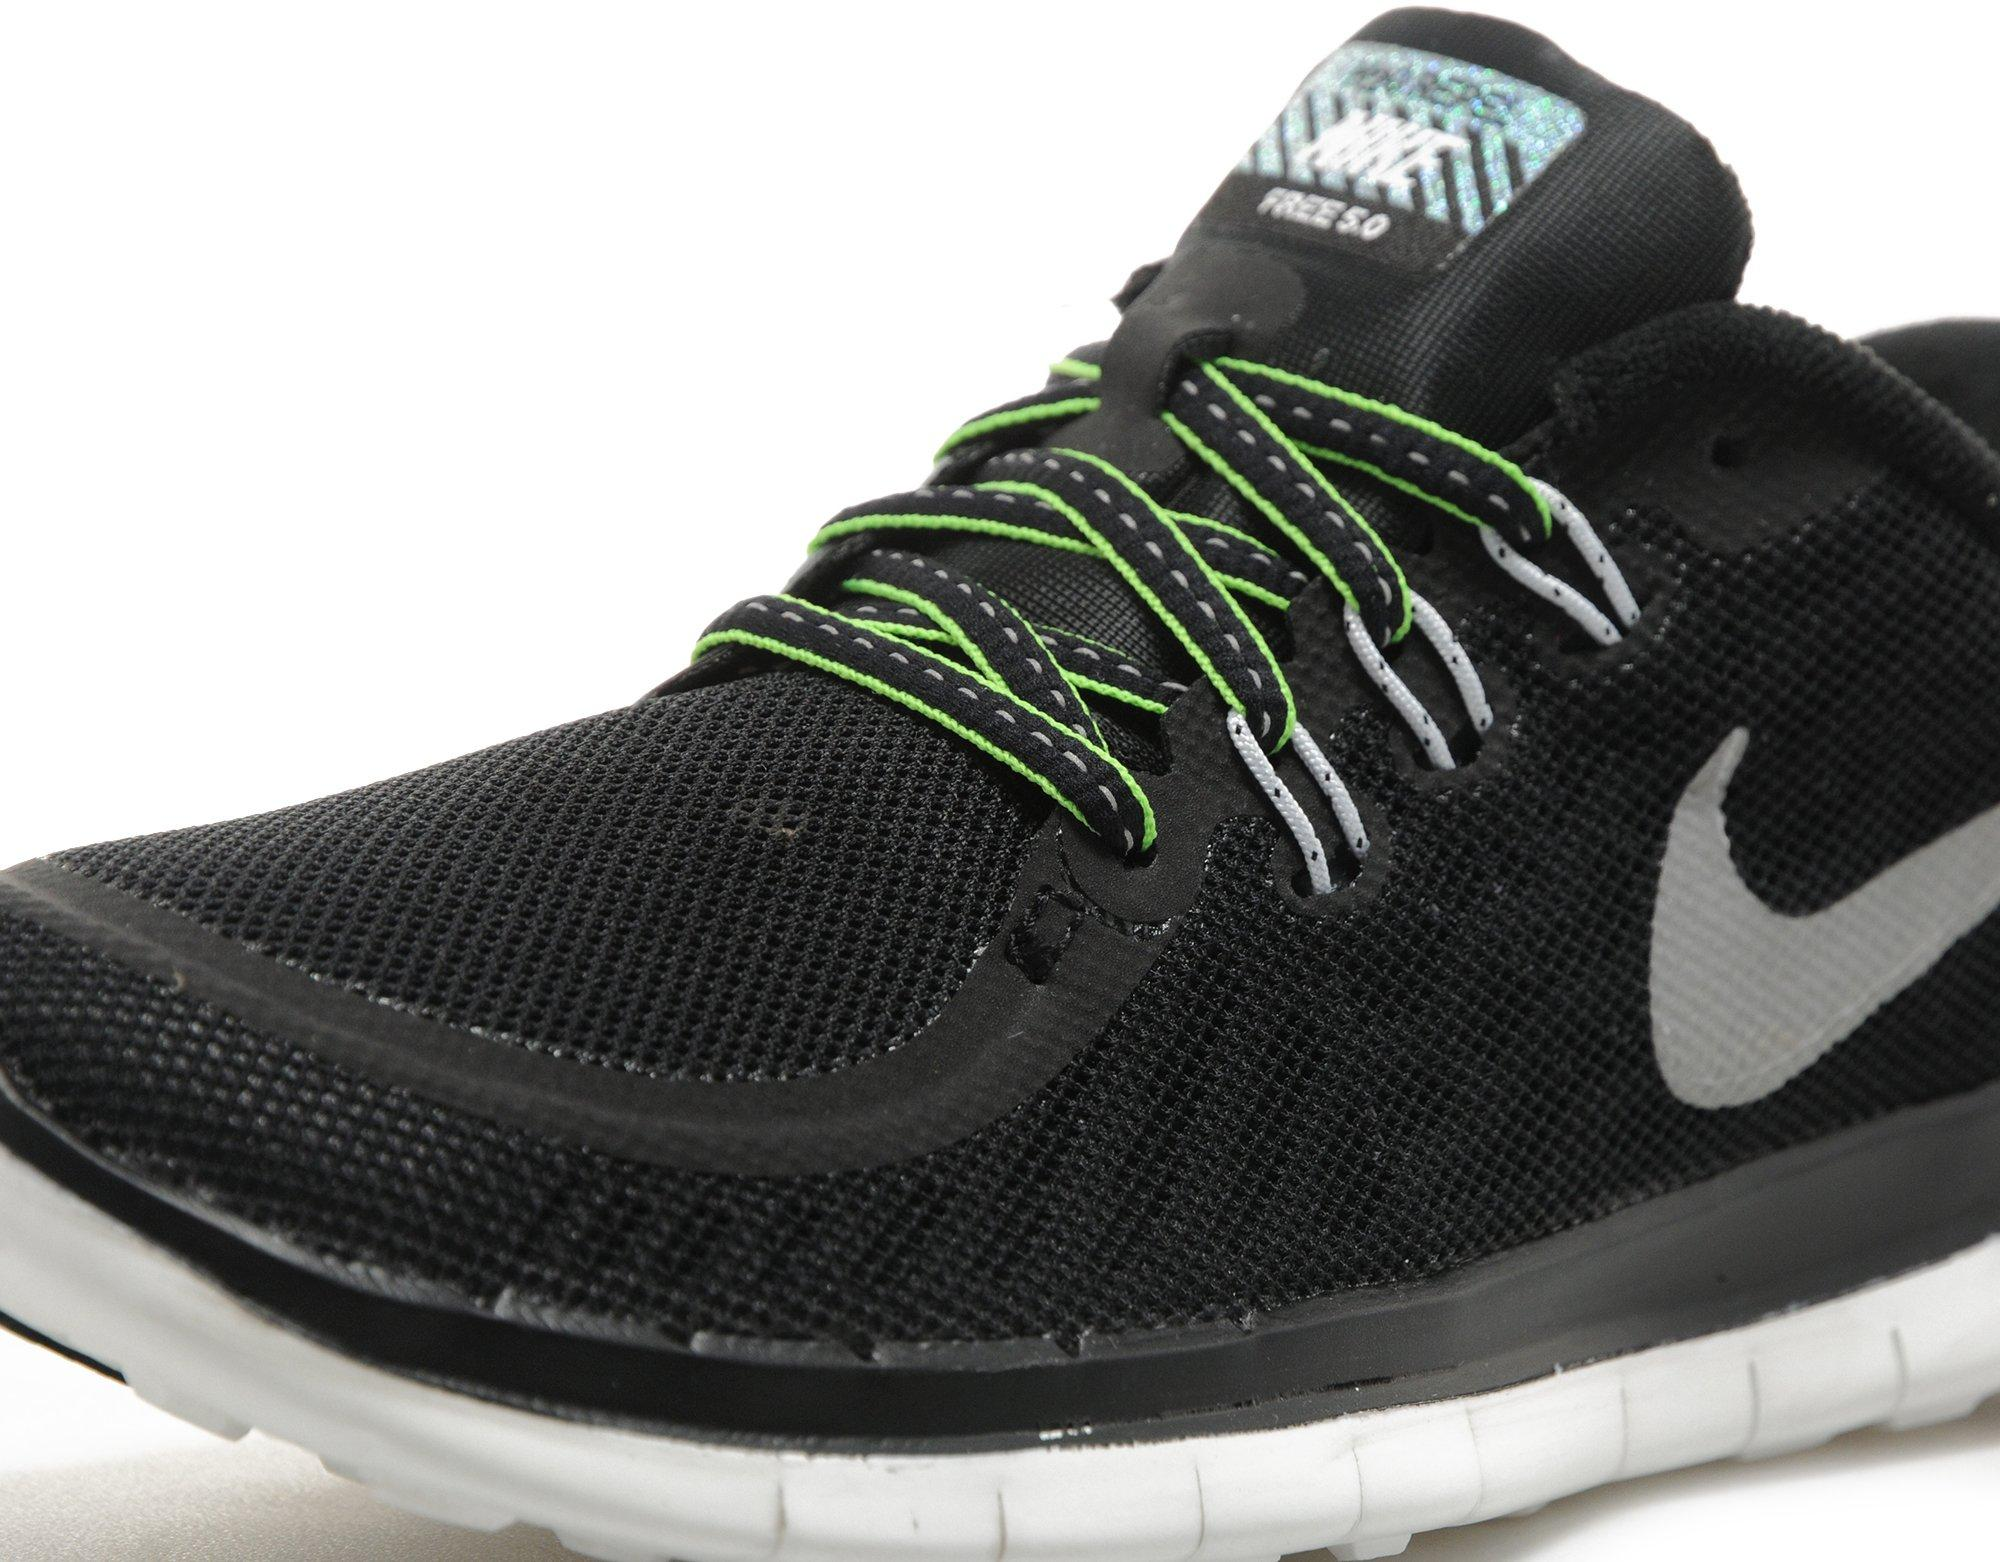 quality design d1f81 32540 Nike Roshe Run Women Grey